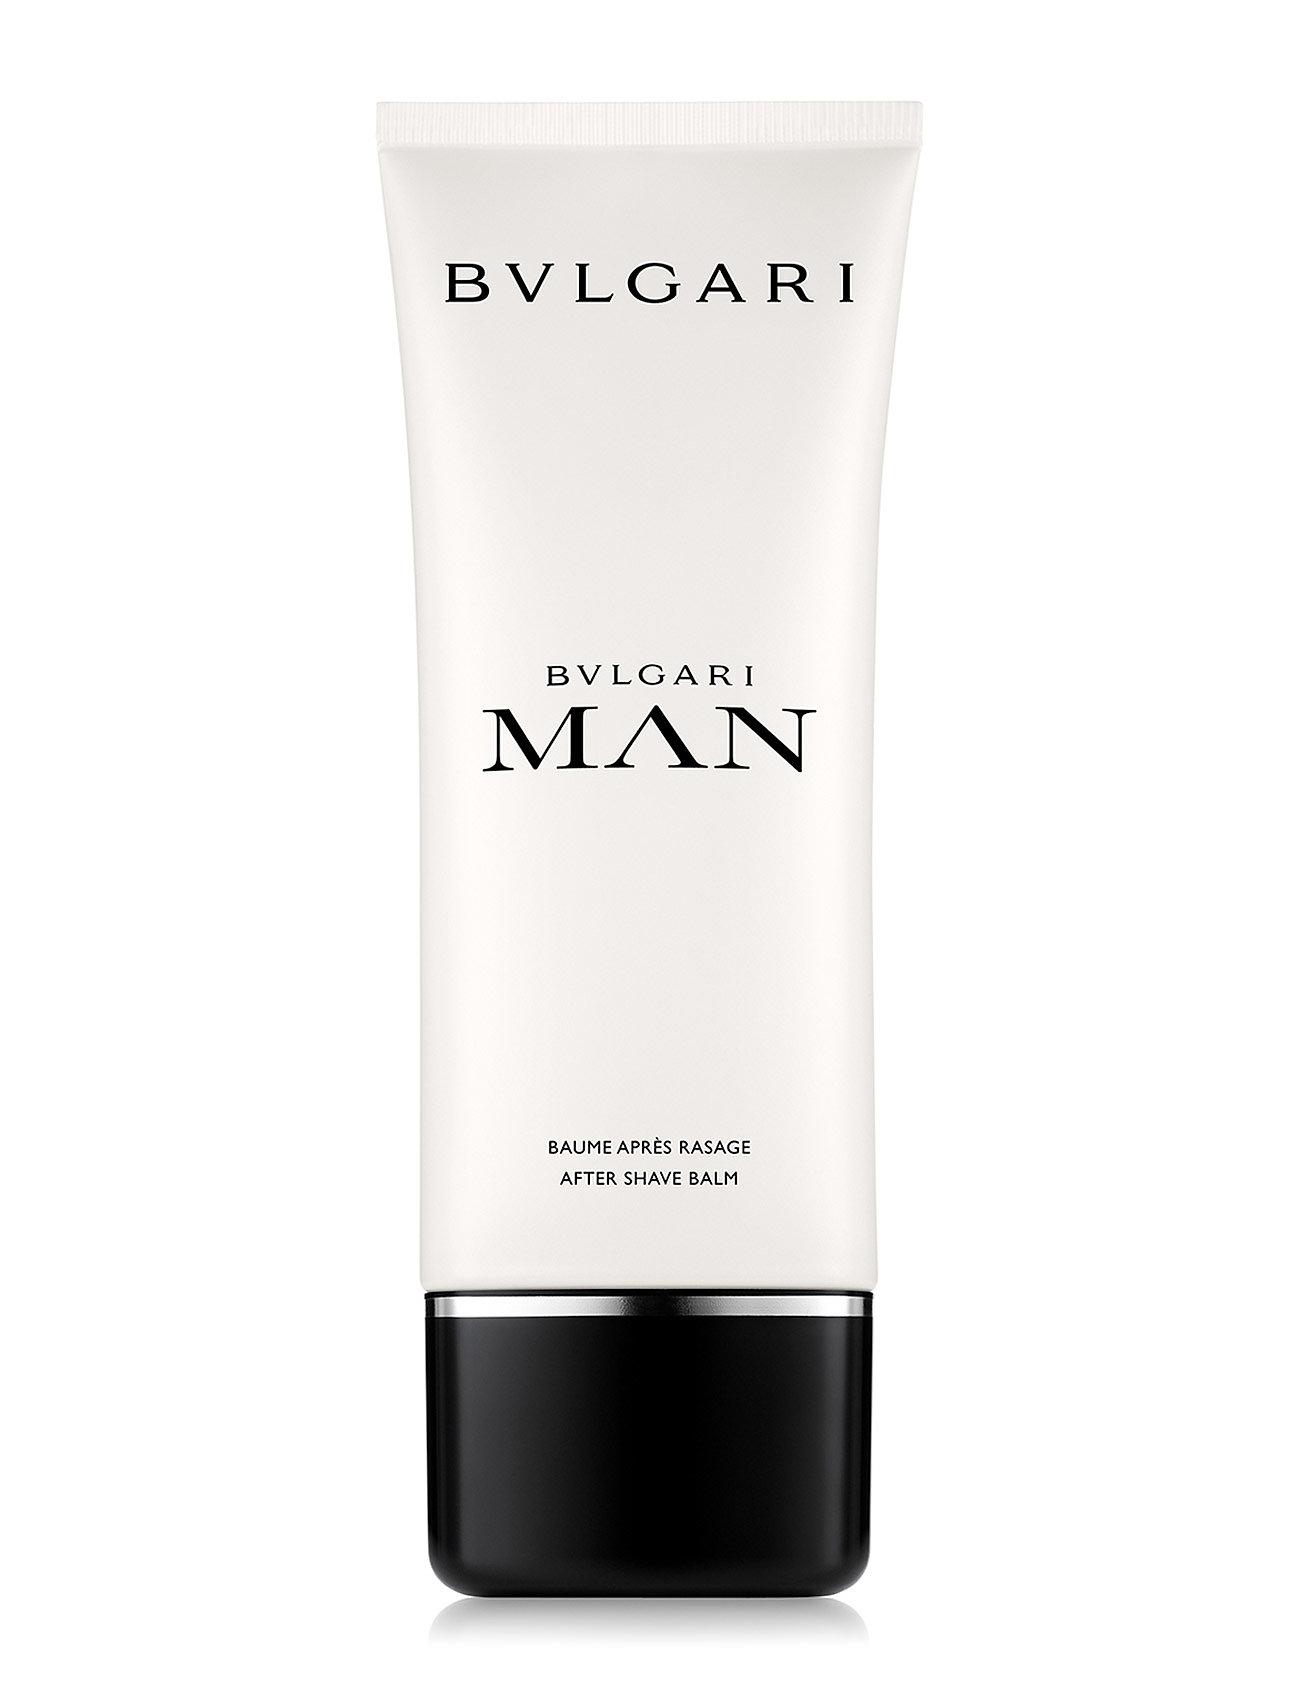 bvlgari B. man after shave lotion 100ml på boozt.com dk